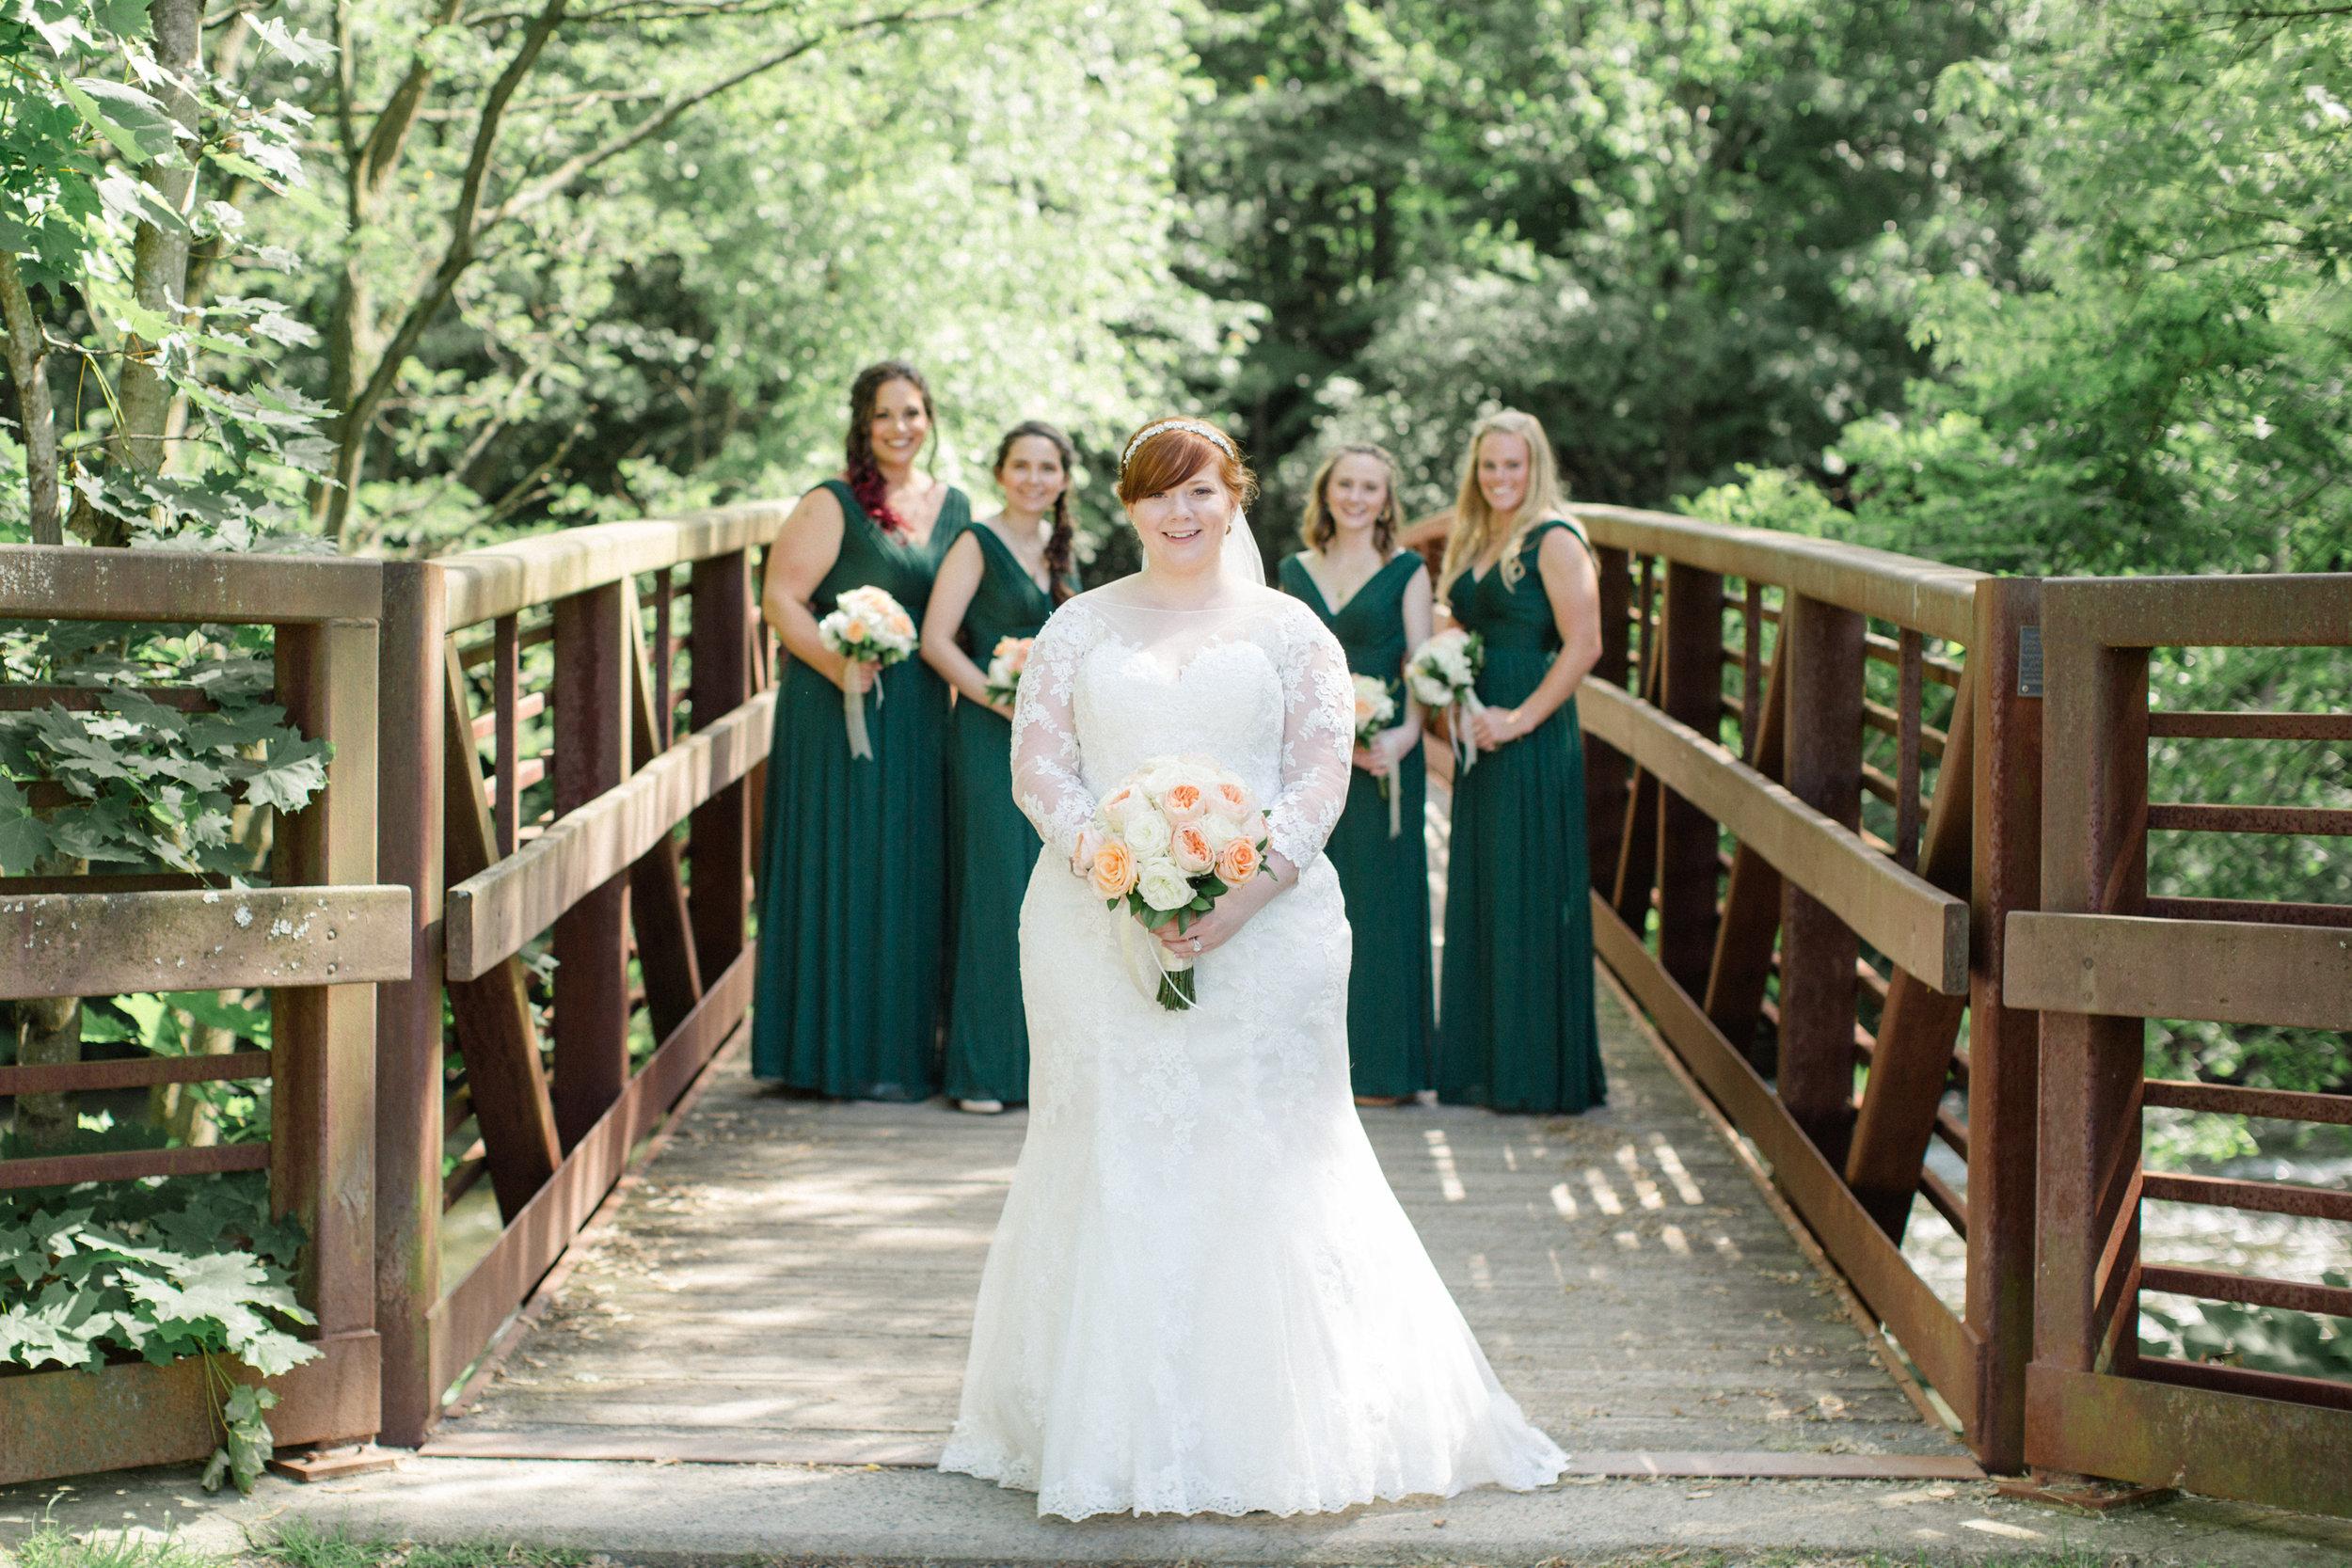 Fiorellis Wedding Photos_JDP-82.jpg